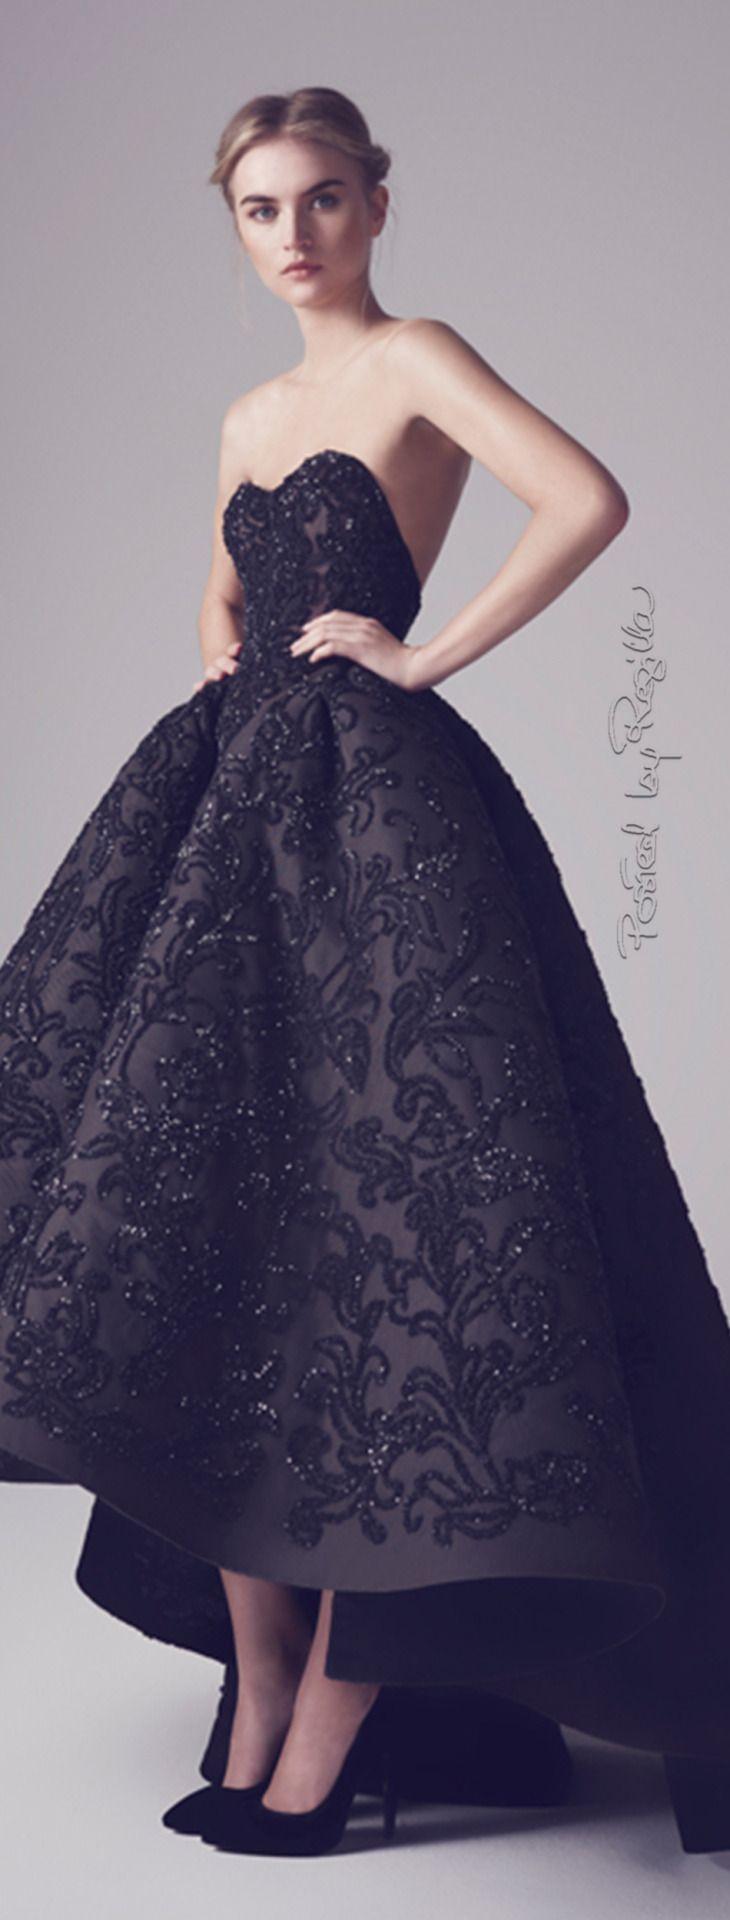 Regilla ⚜ Ashi Studio | dresses | Pinterest | Moda para mujer ...